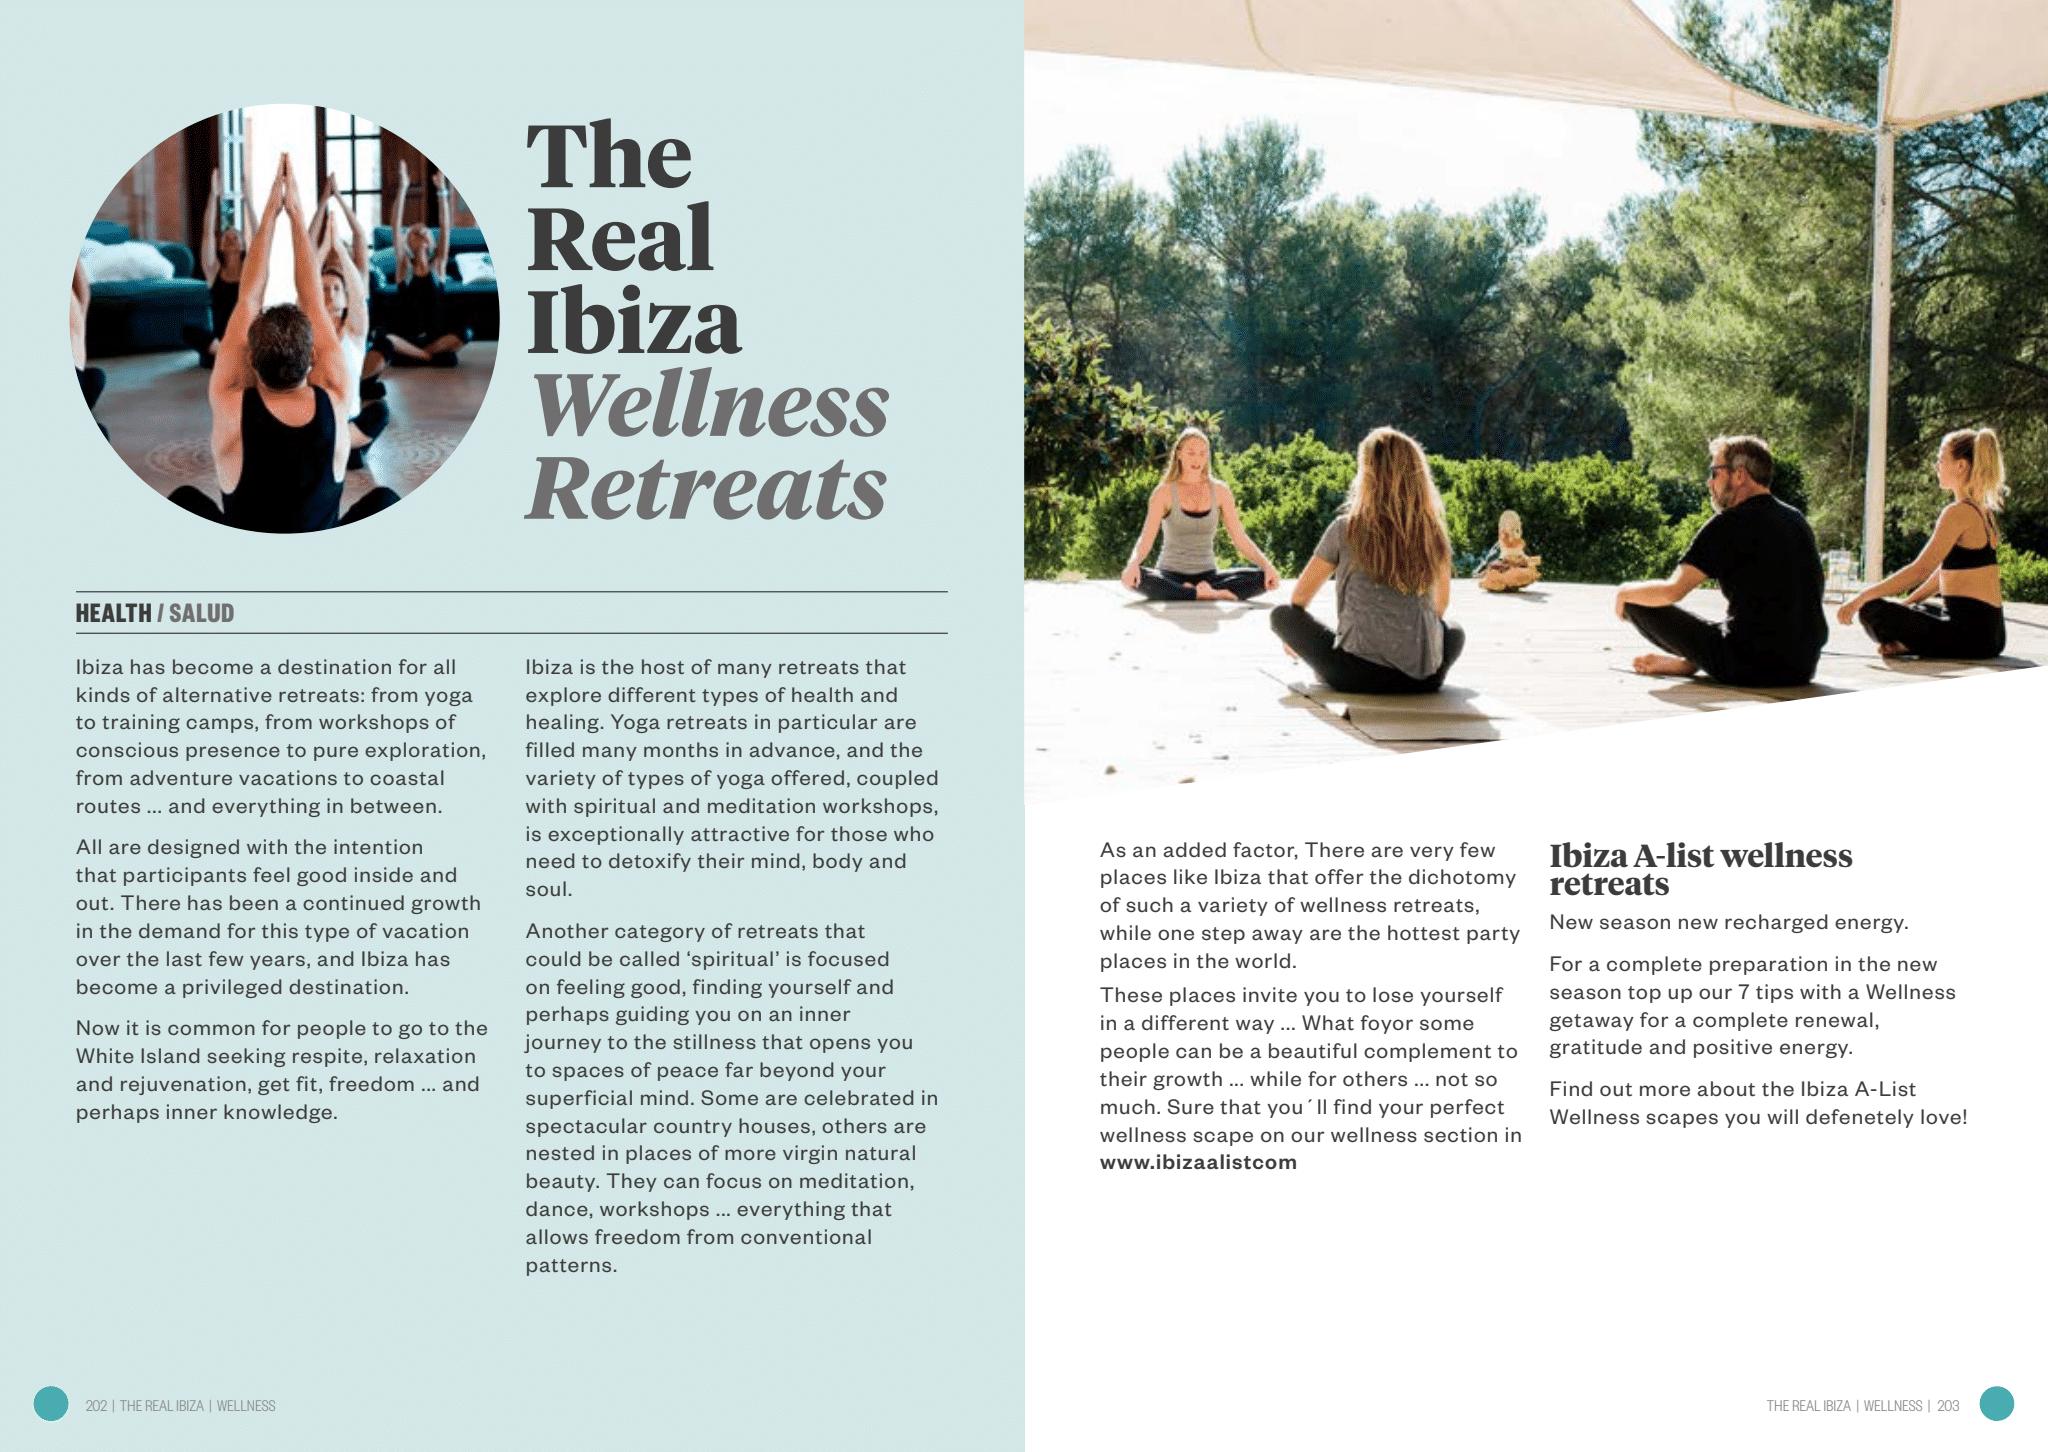 The Real Ibiza. Wellness retreats. Retiros de bienestar.